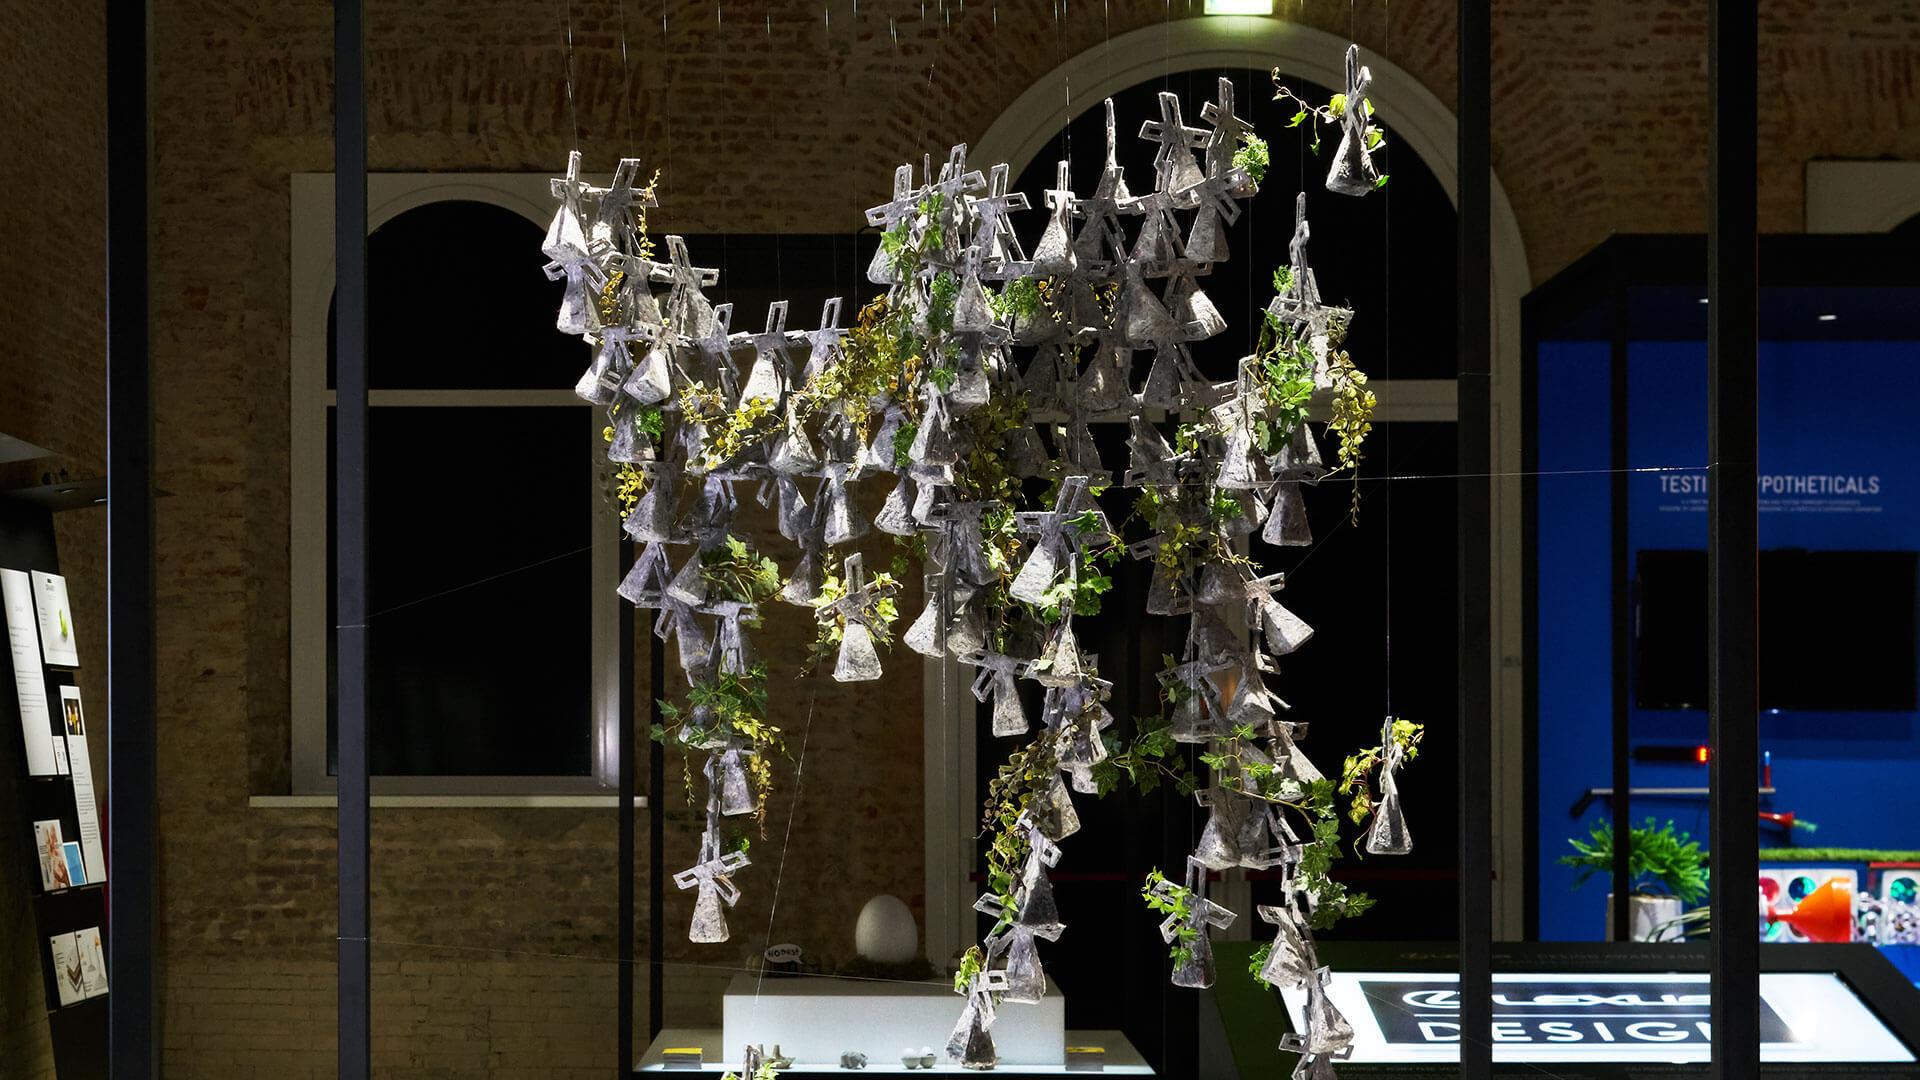 lexus lda 2018 winners gallery protoype recycled fiber planter